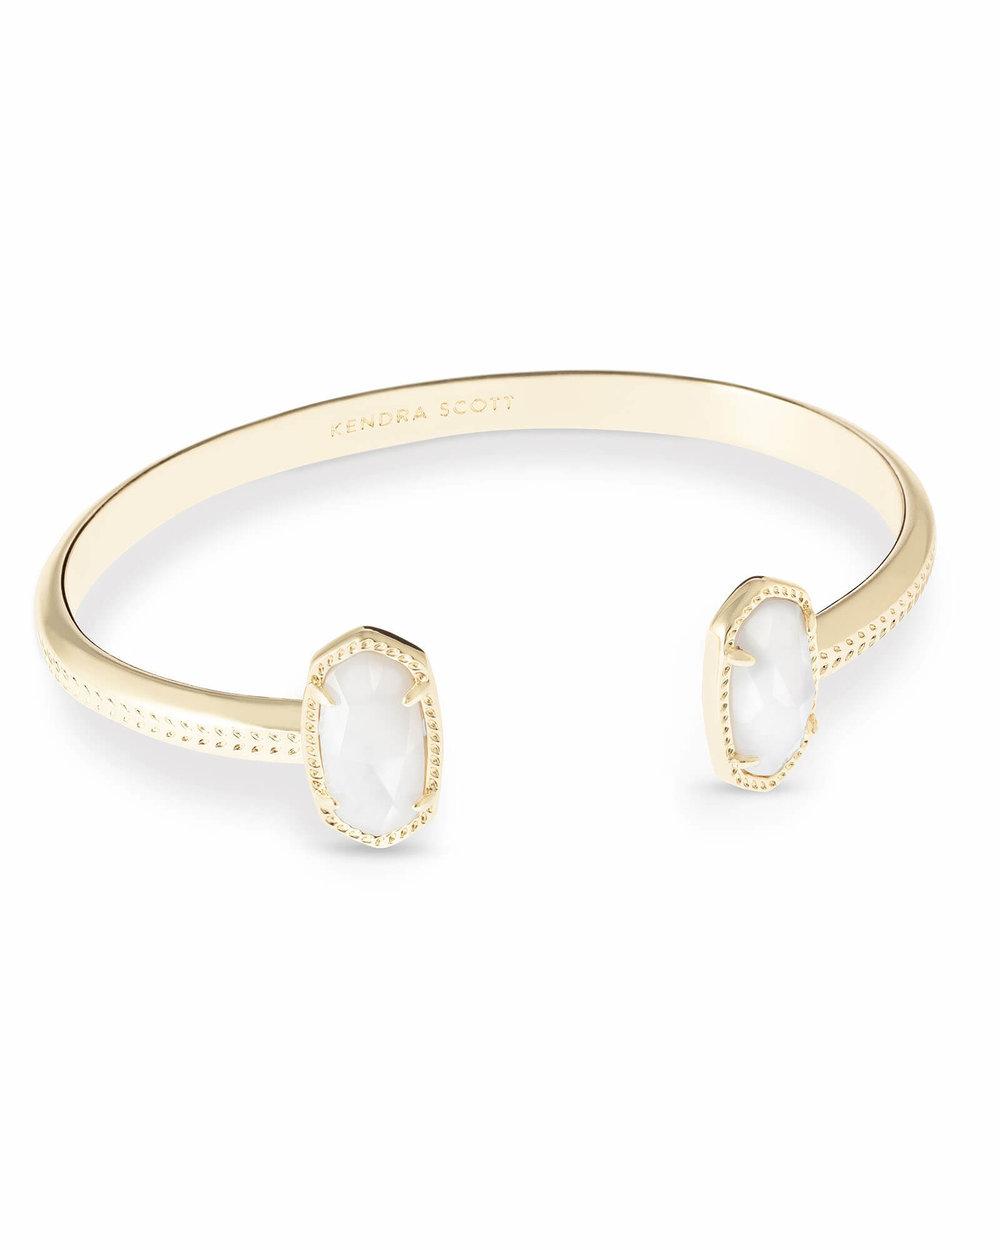 kendra-scott-elton-gold-cuff-bracelet-in-white-pearl_00_default_lg.jpg